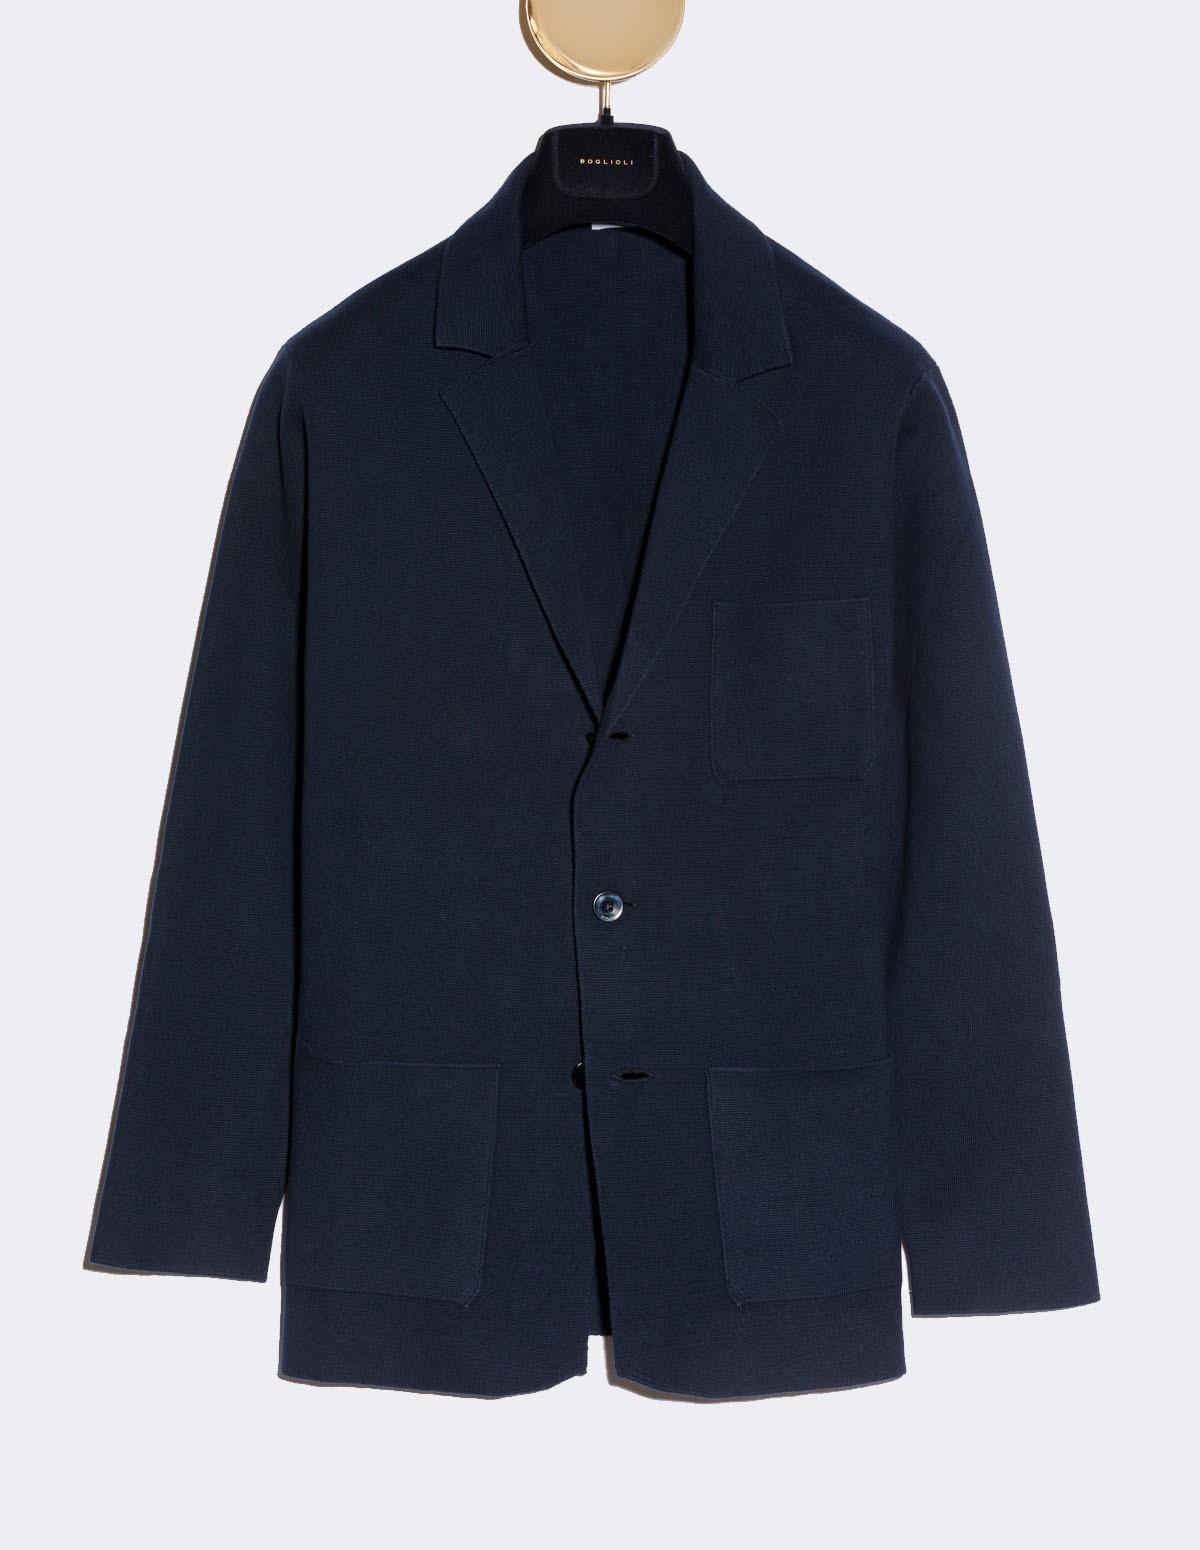 Boglioli Knitted Jacket